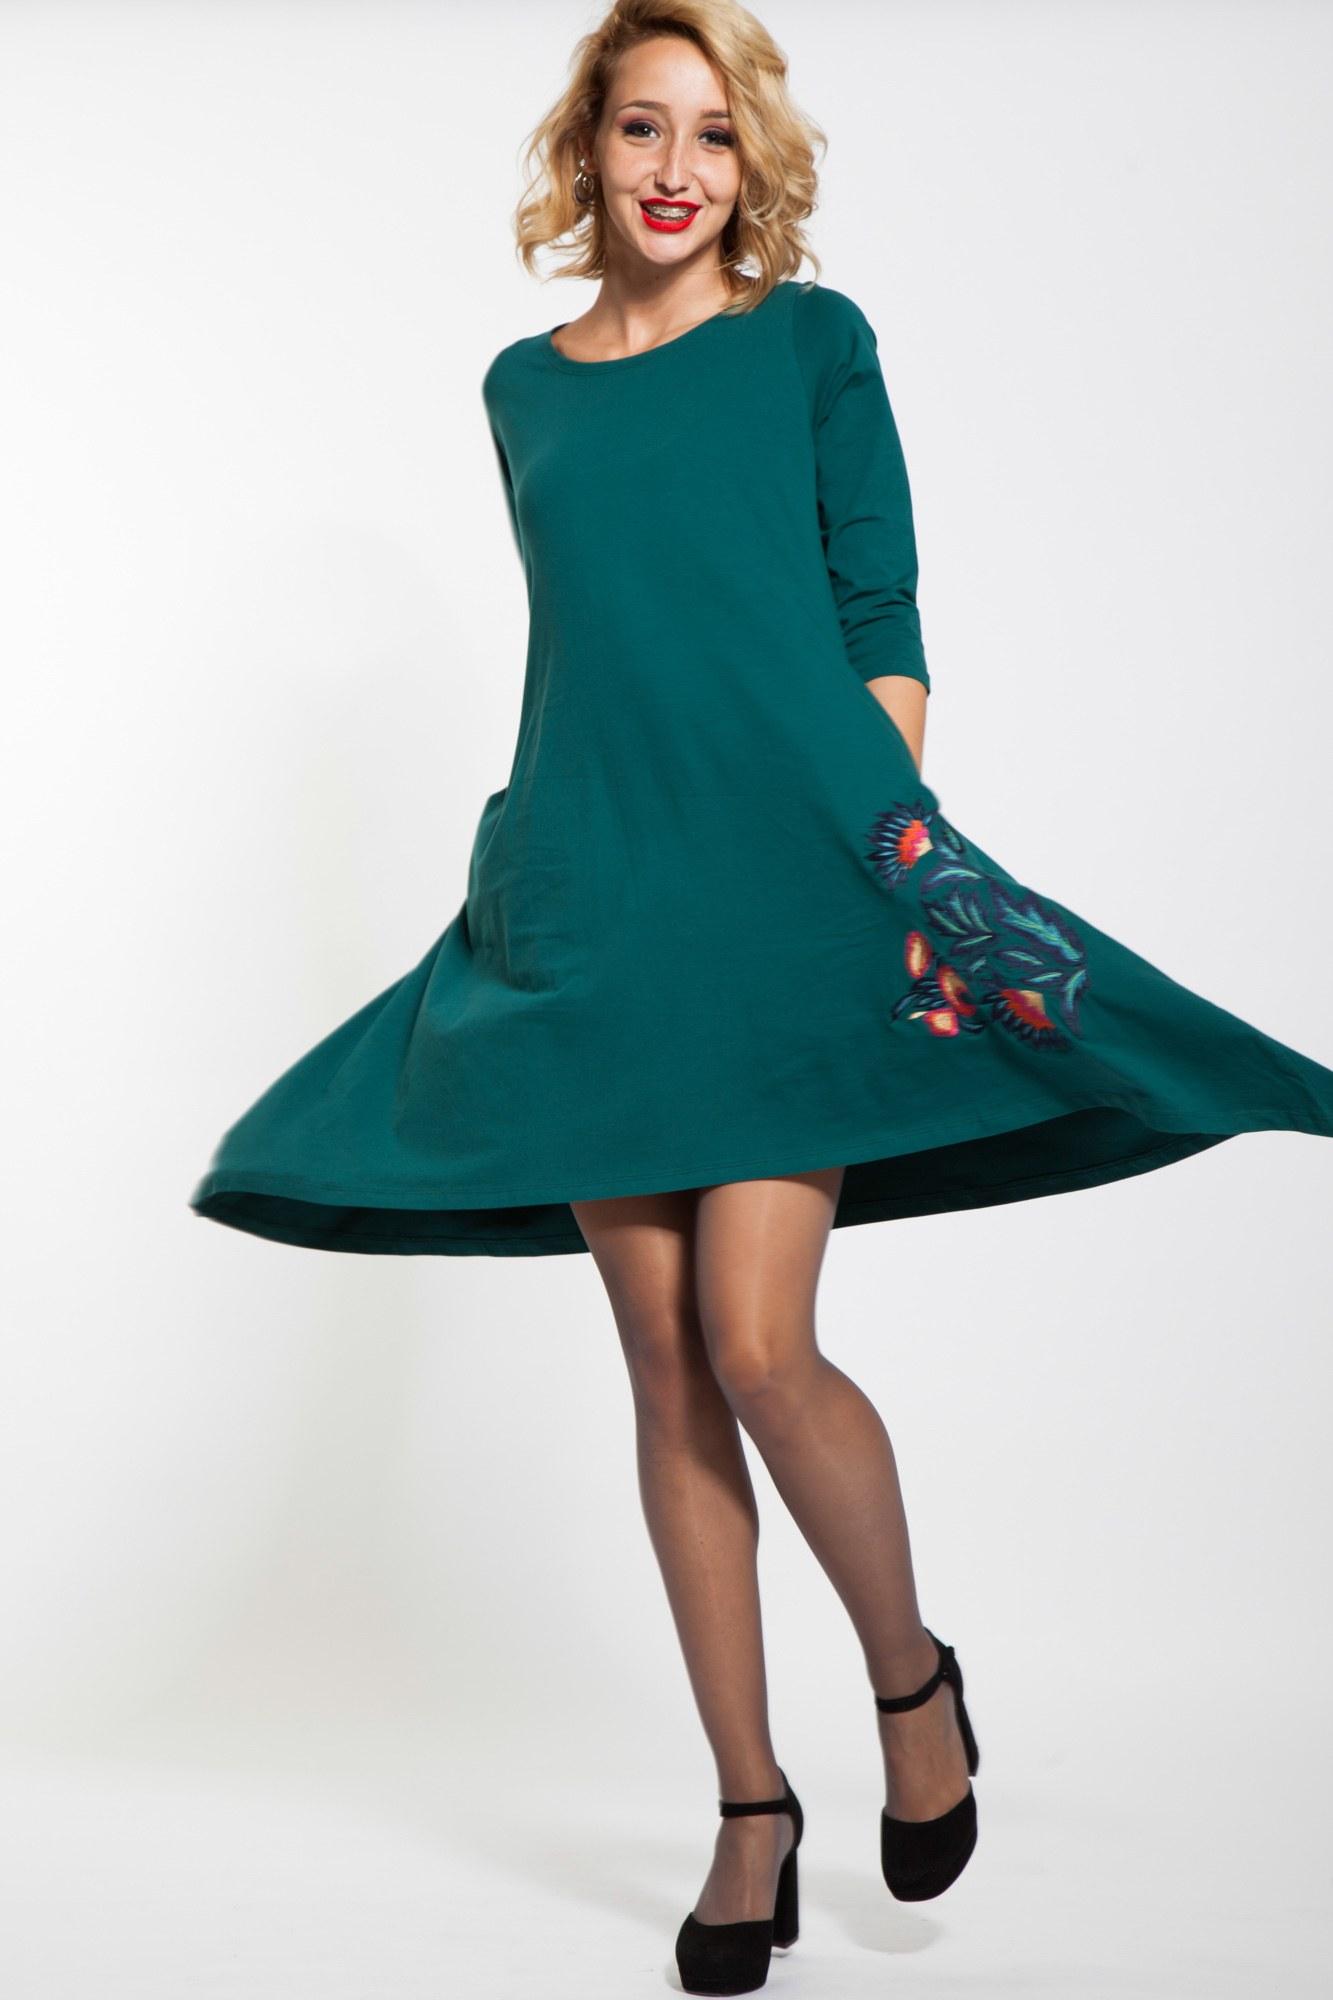 Rochie verde asimetrica Aspasis brodata